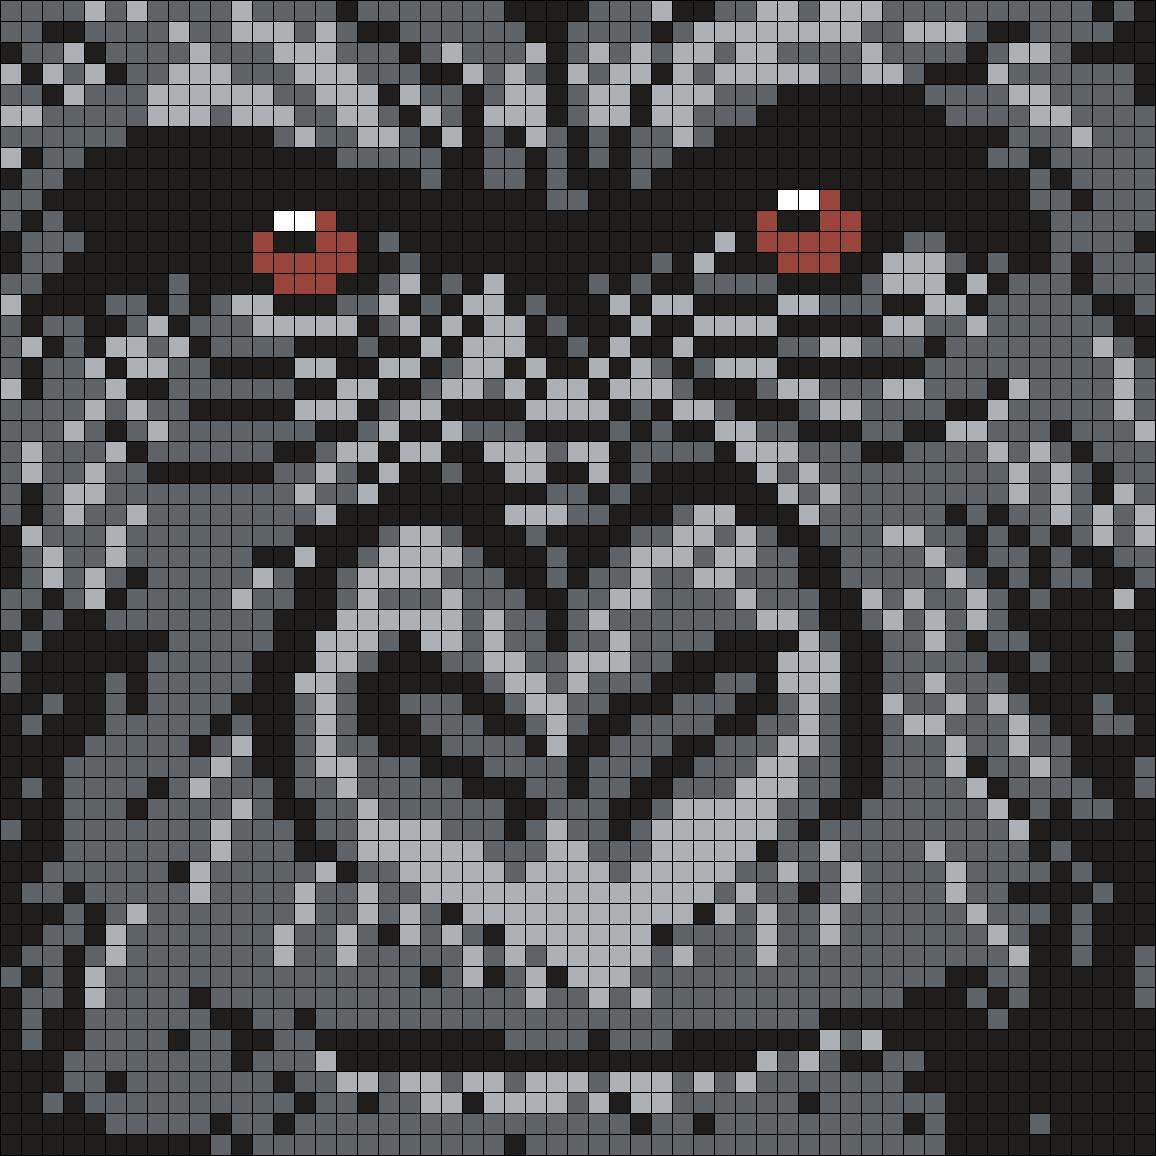 Gorilla (Square)